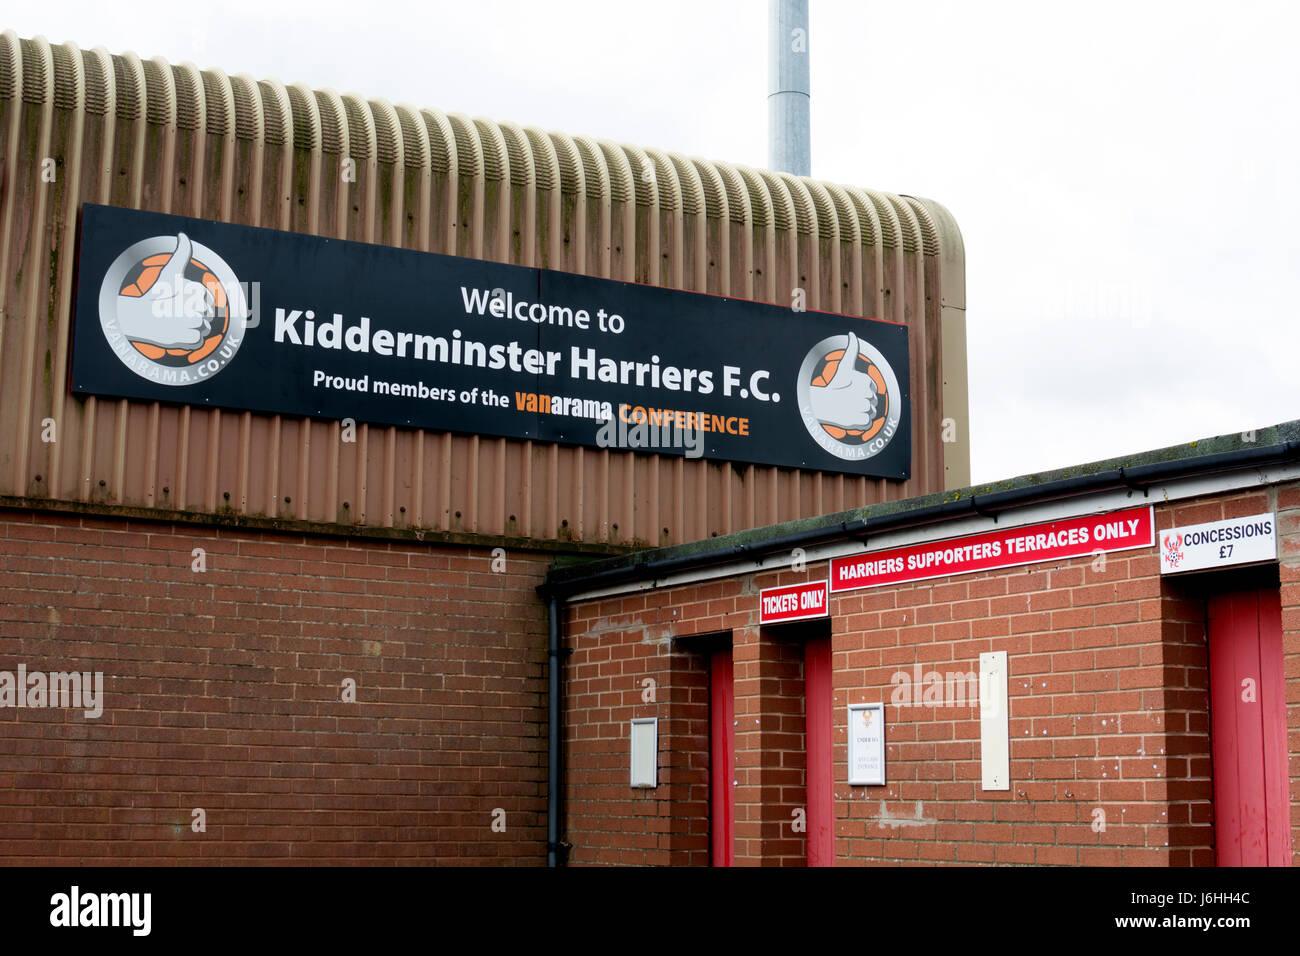 Kidderminster Harriers football ground, Worcestershire, England, UK - Stock Image